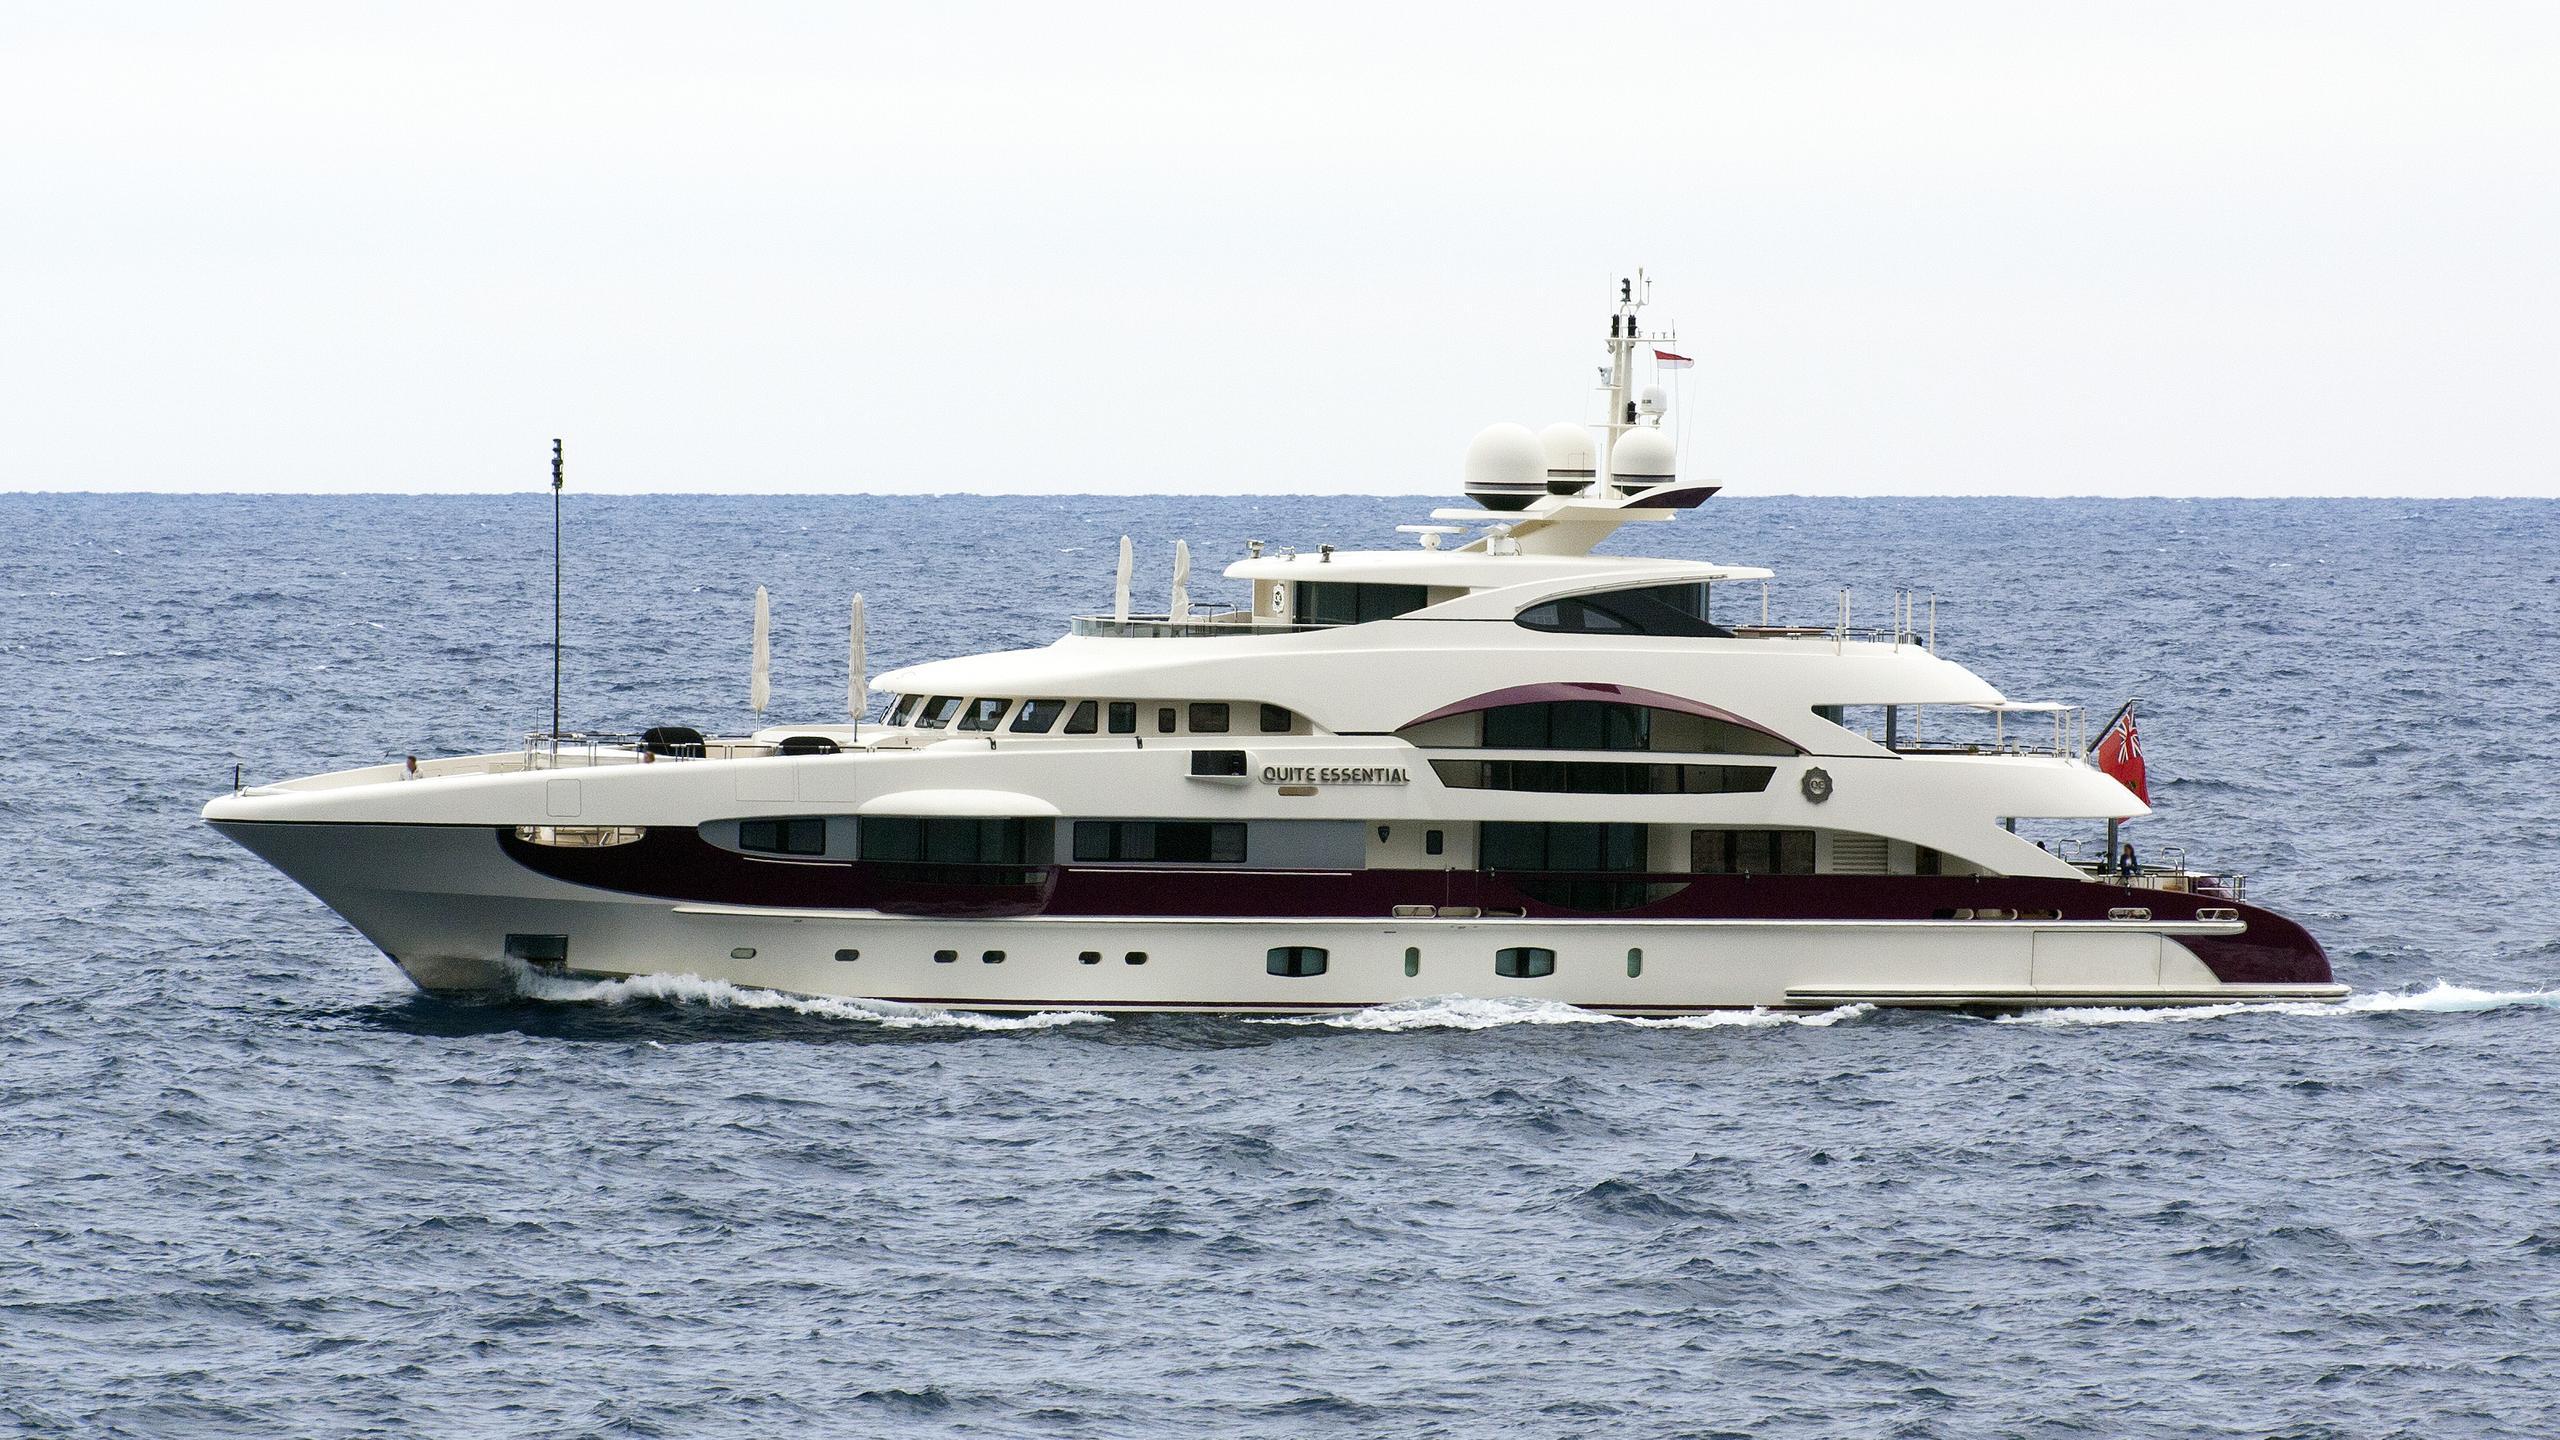 quite-essential-motor-yacht-heesen-5000-2011-55m-cruising